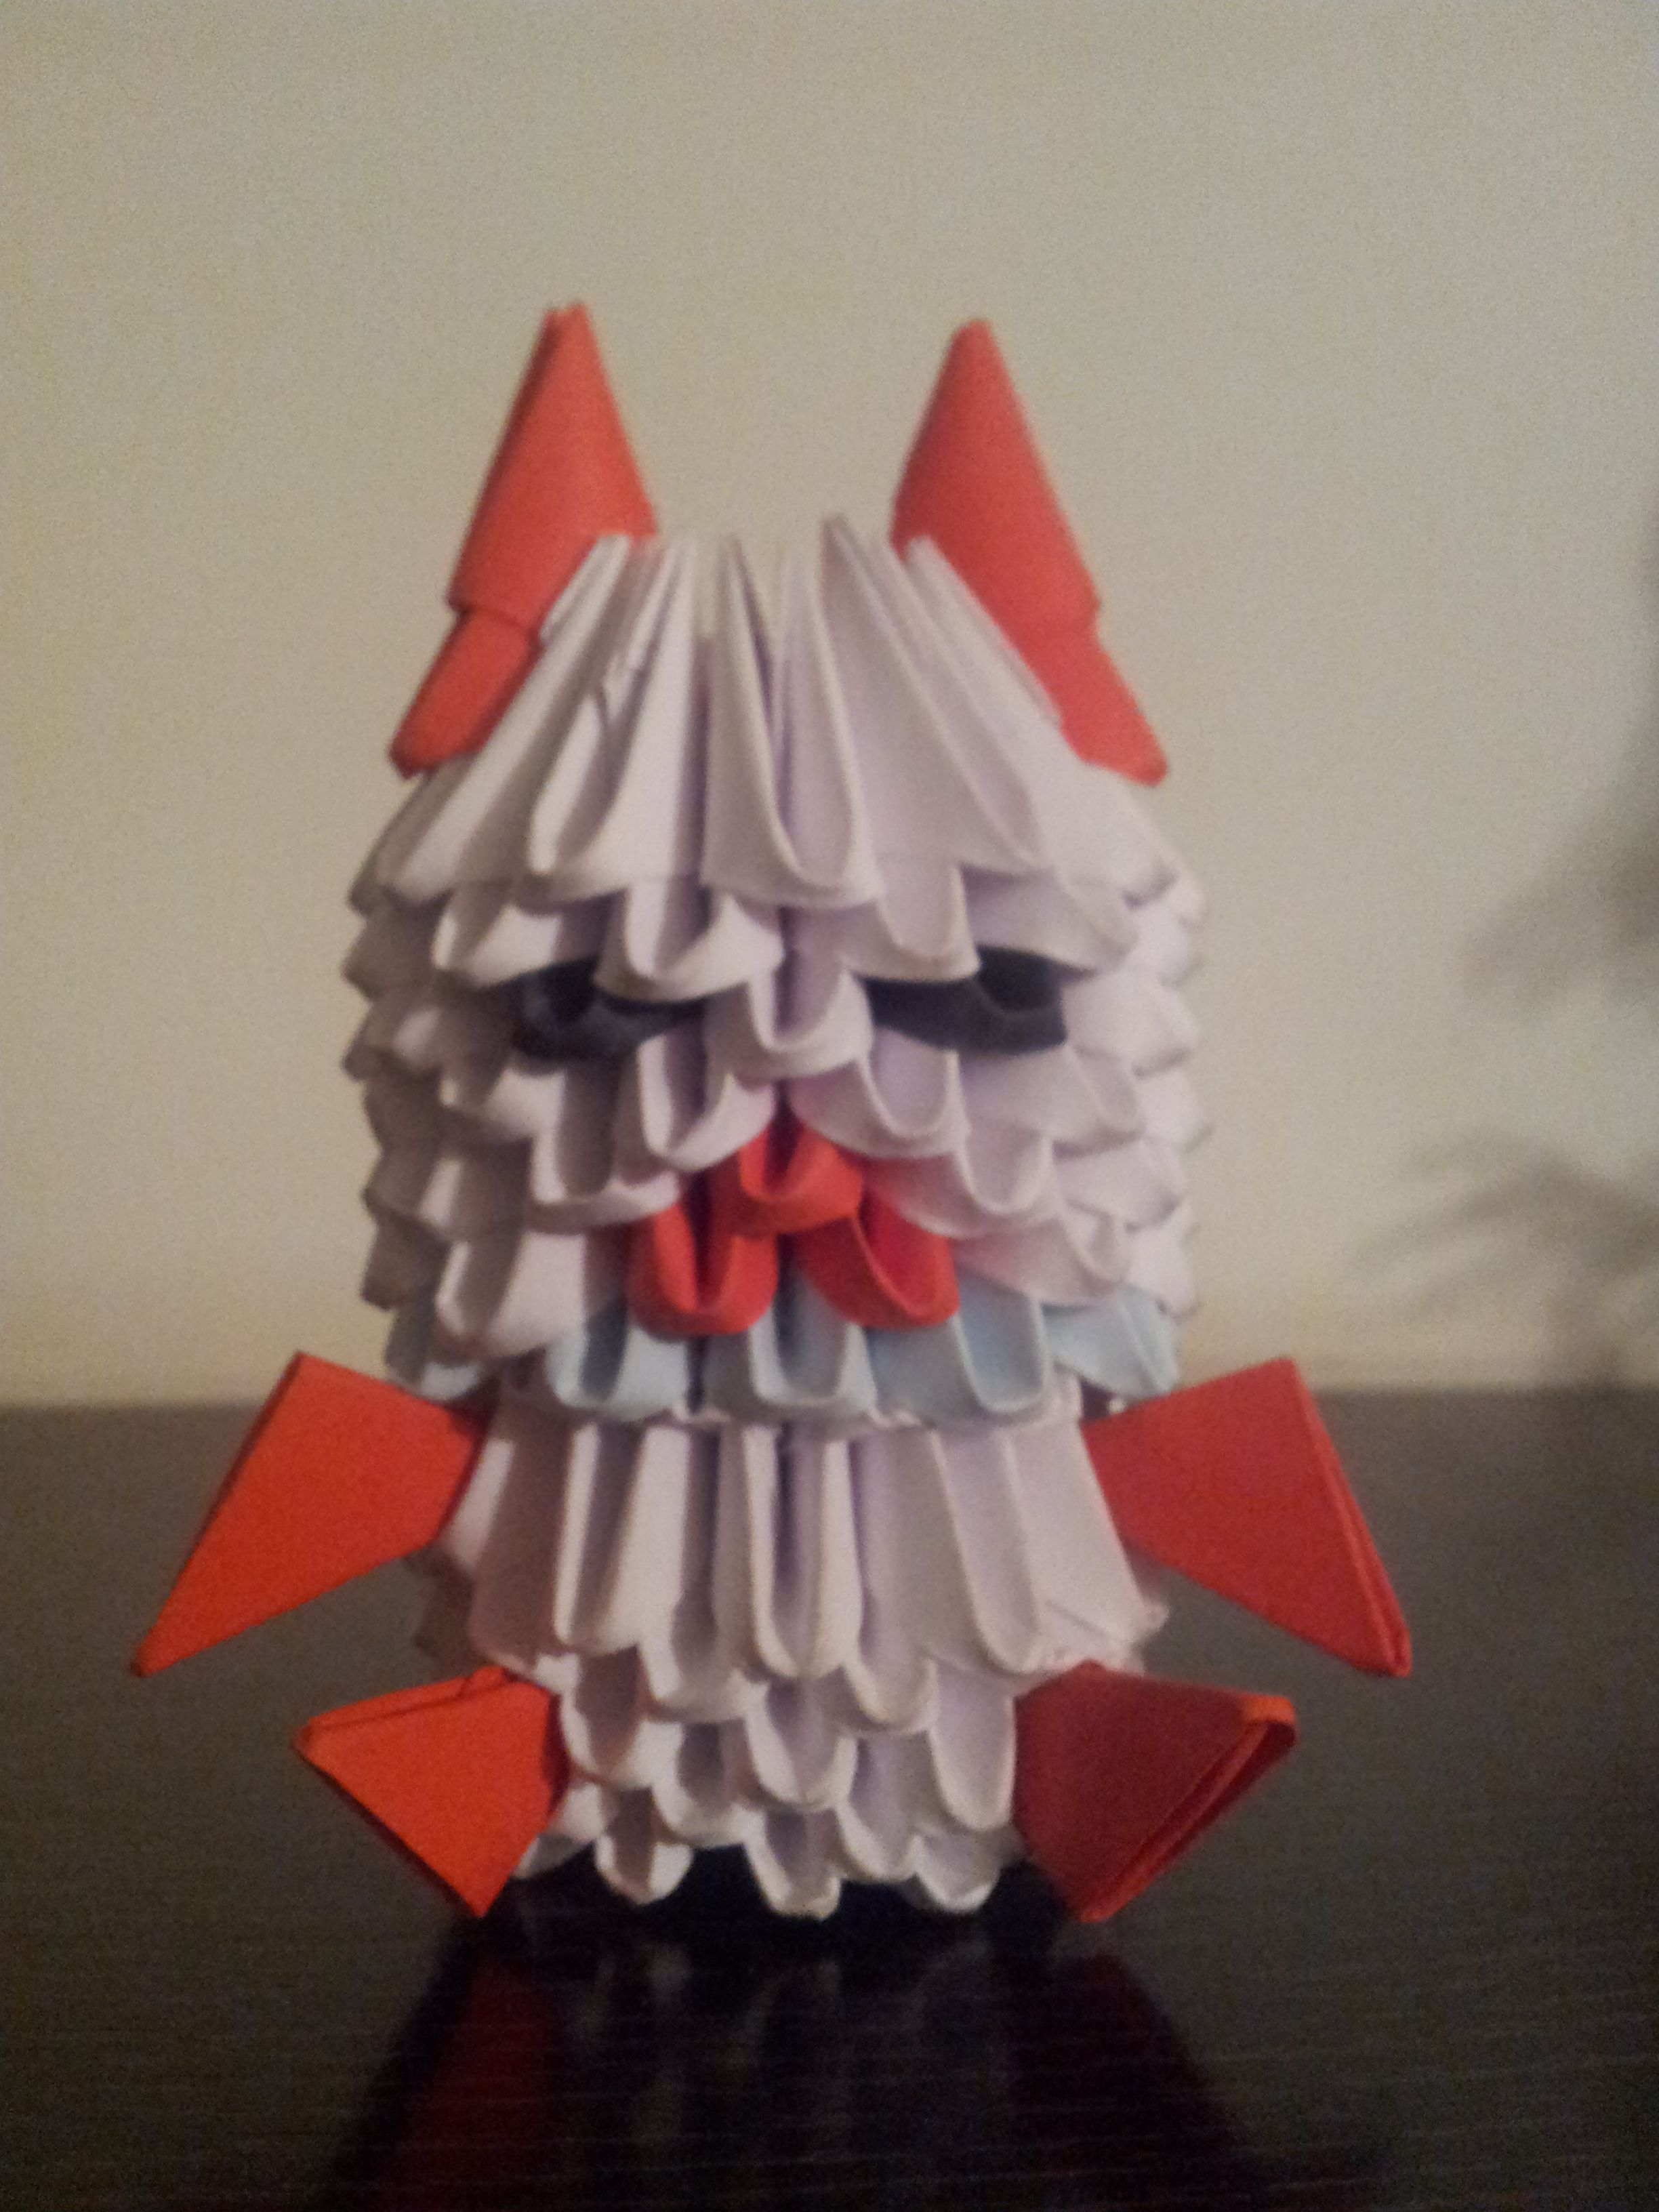 ORIGAMI 3D. Vampiro, piezas de 6x4.